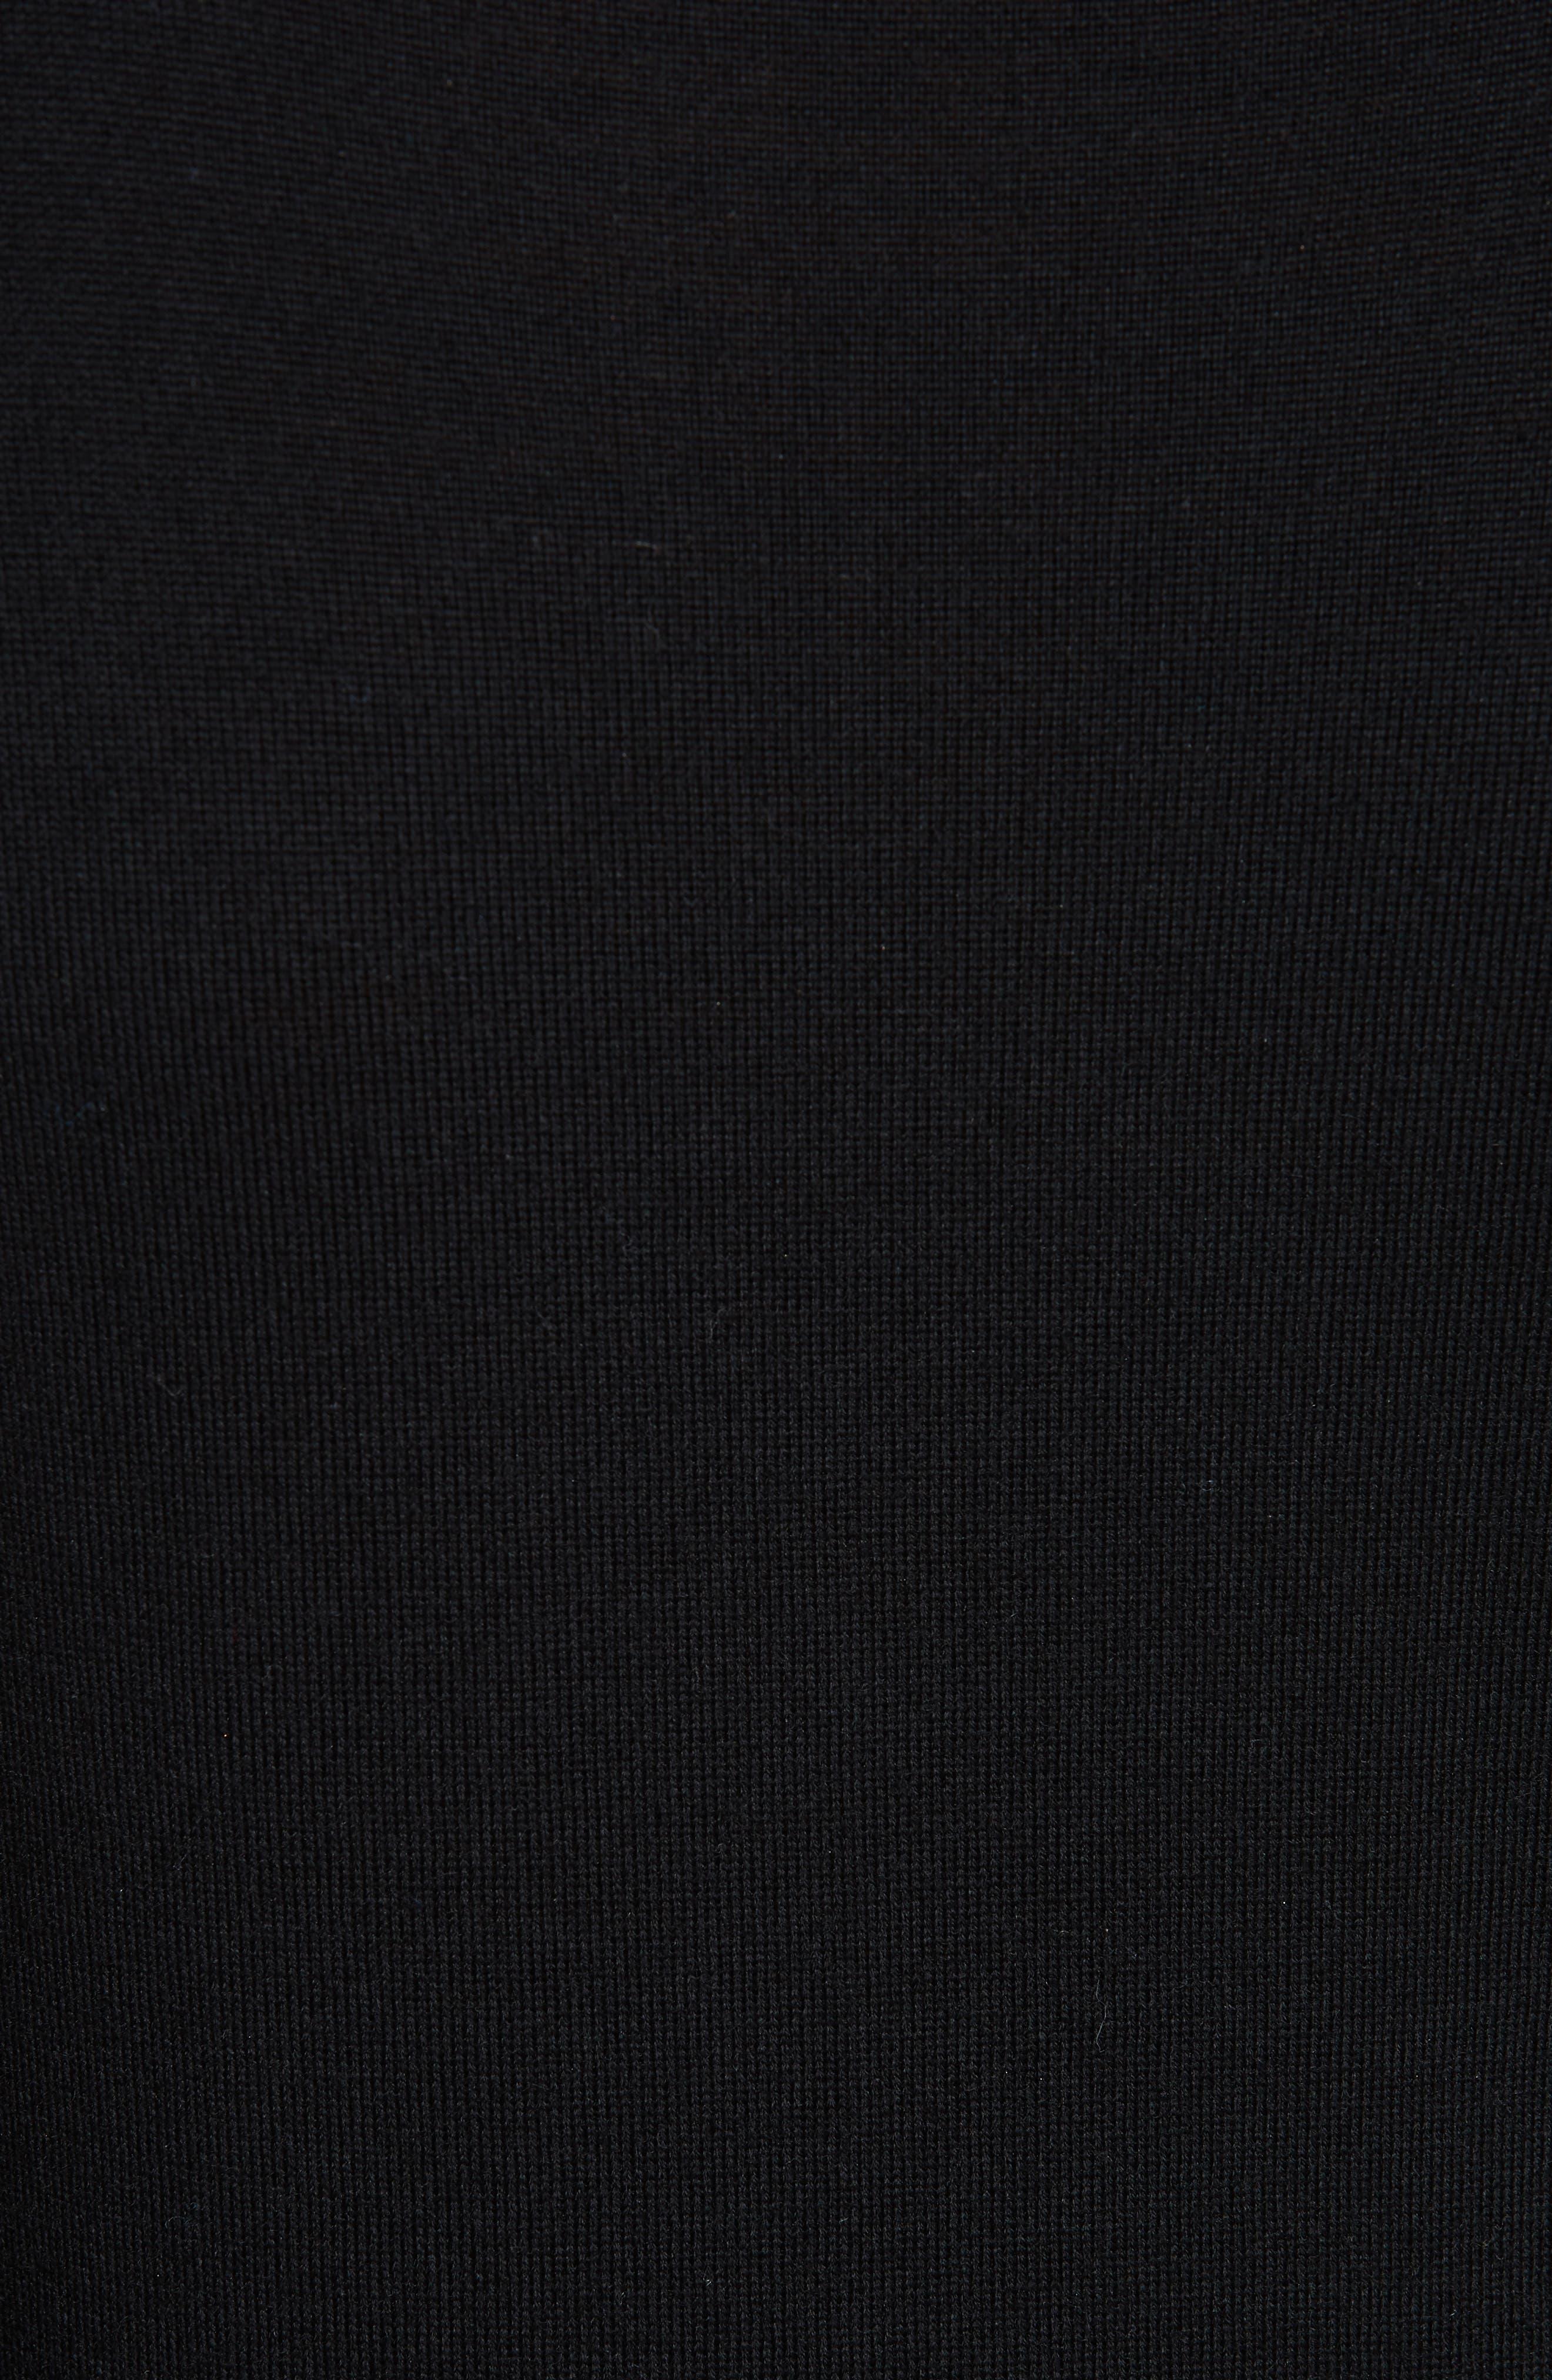 Adler Stretch Silk Sleeve Merino Wool Sweater,                             Alternate thumbnail 5, color,                             BLACK FLORAL